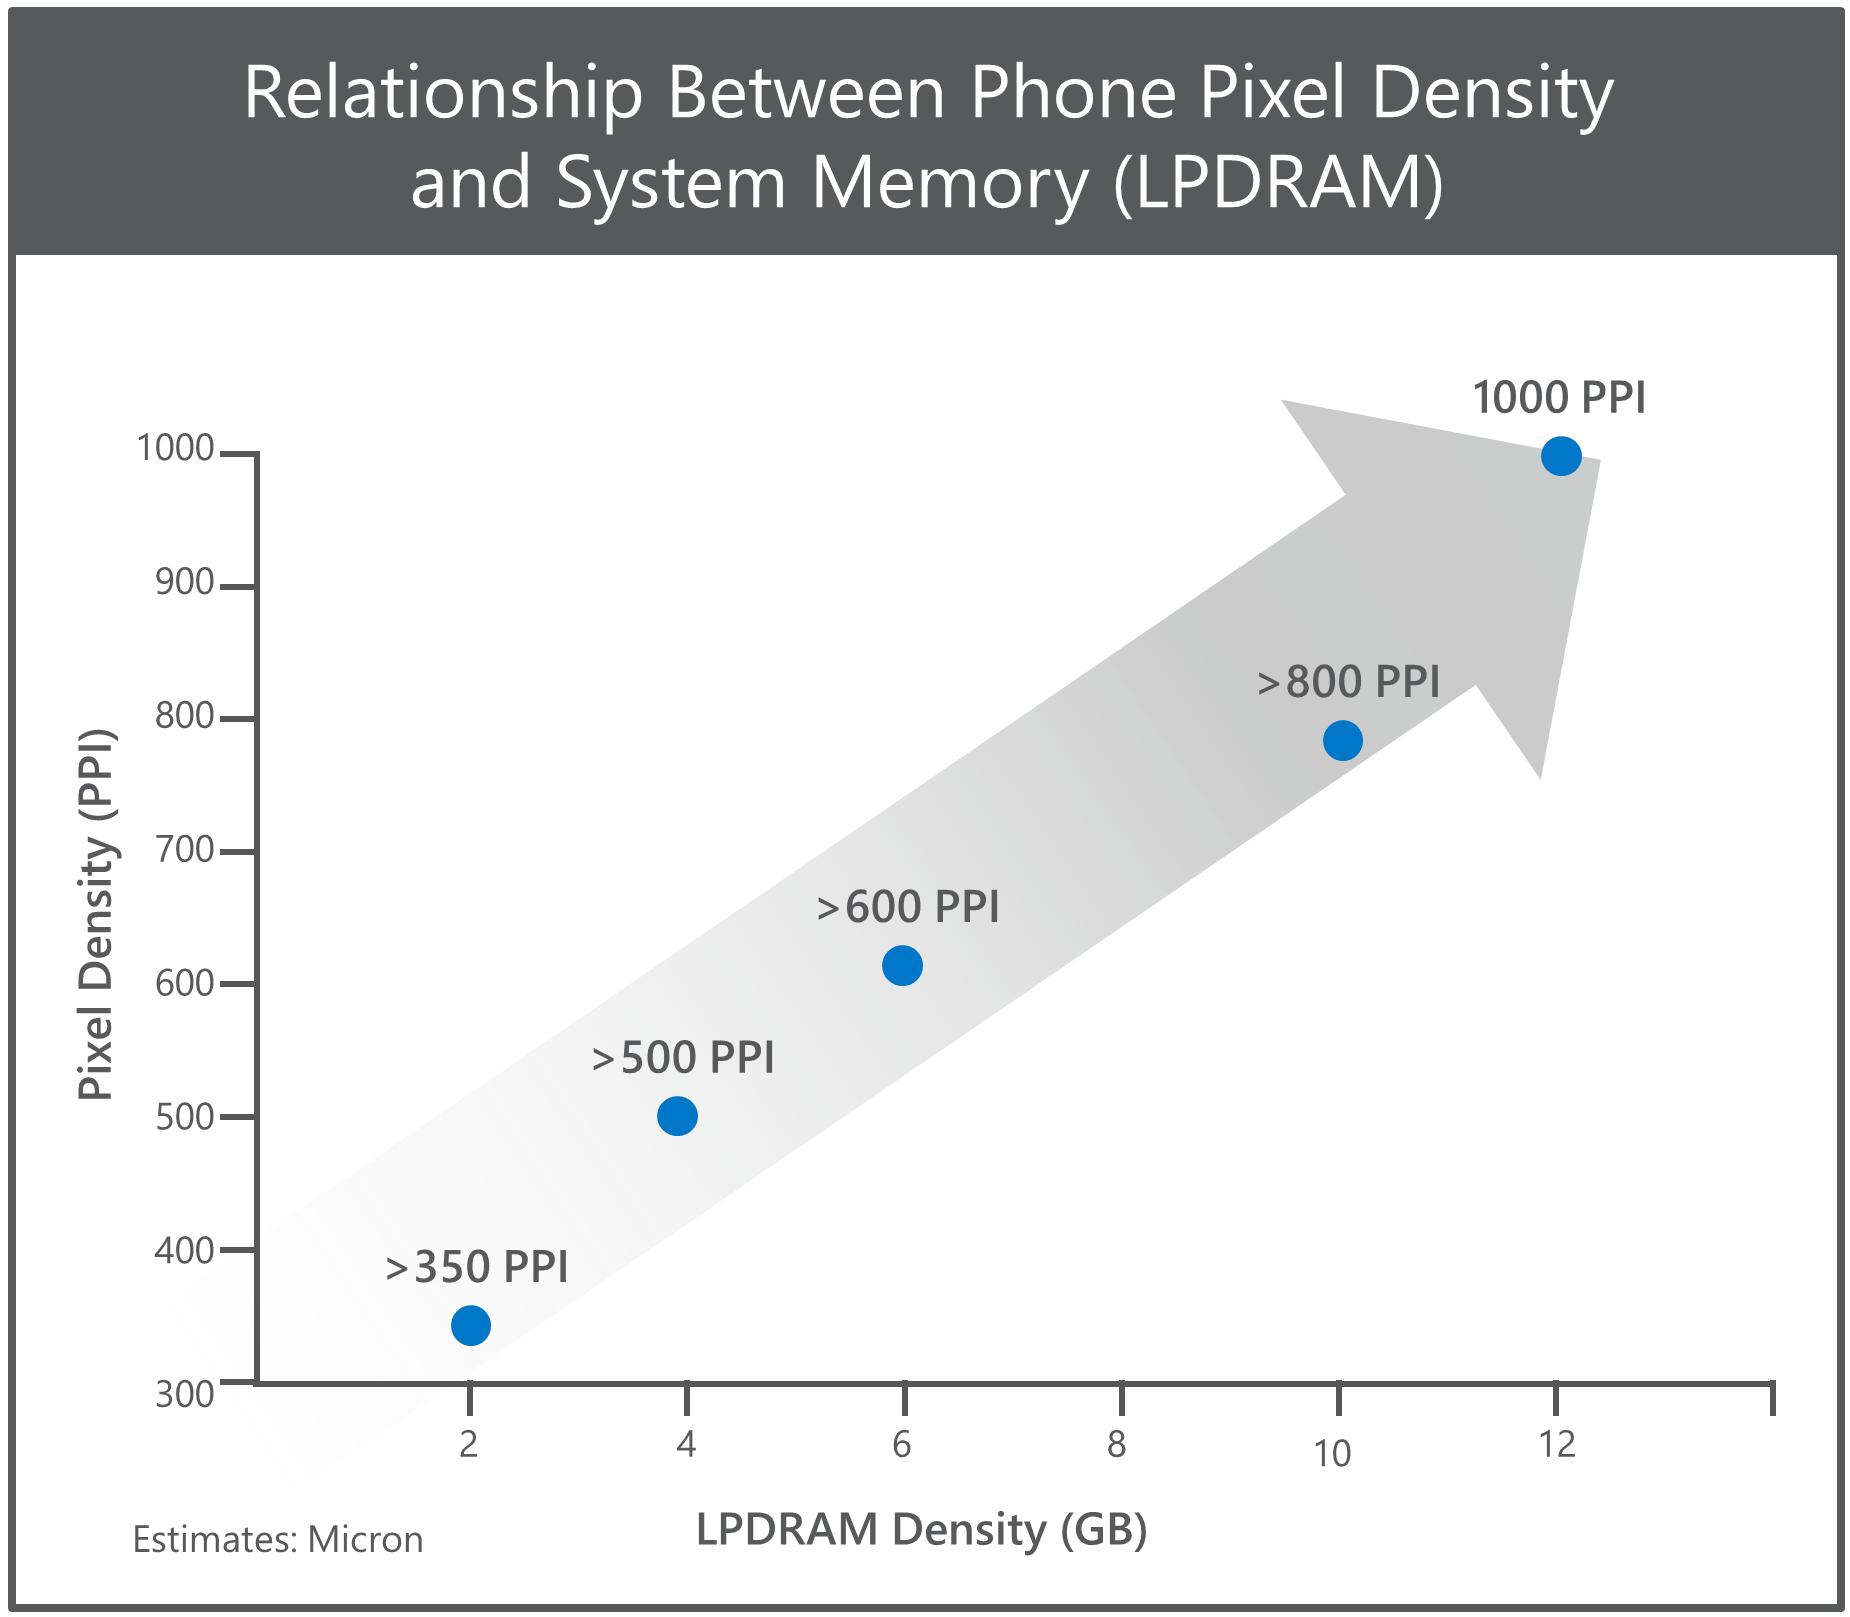 Relationship Between Phone Pixel Density and System Memory (LPDRAM)